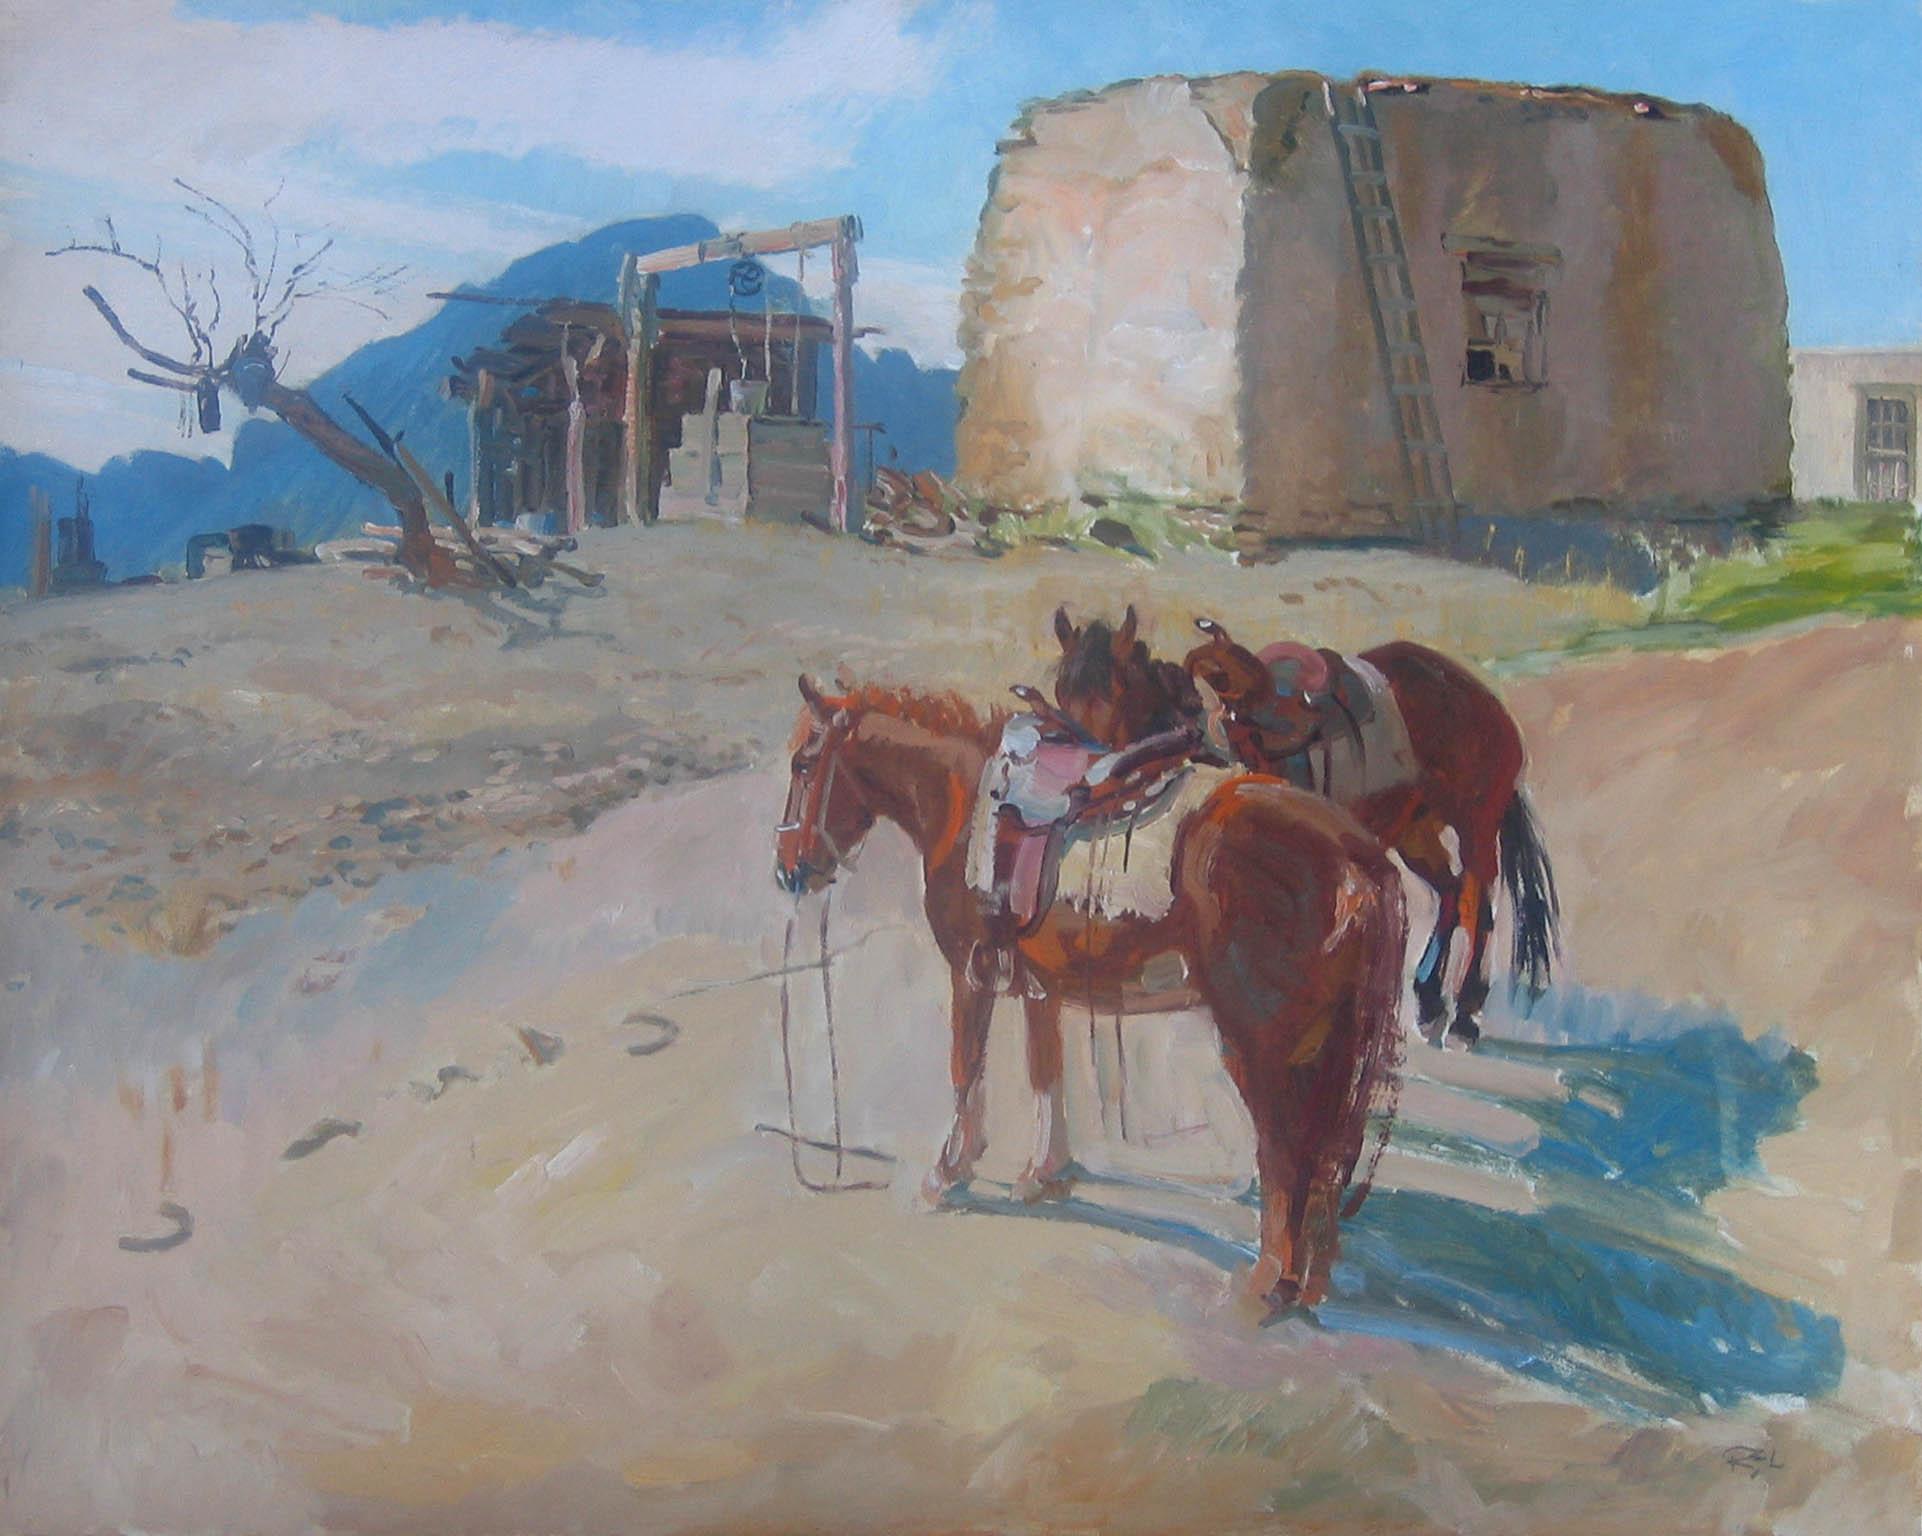 Casa - New Mexico by  Robert Lougheed - Masterpiece Online